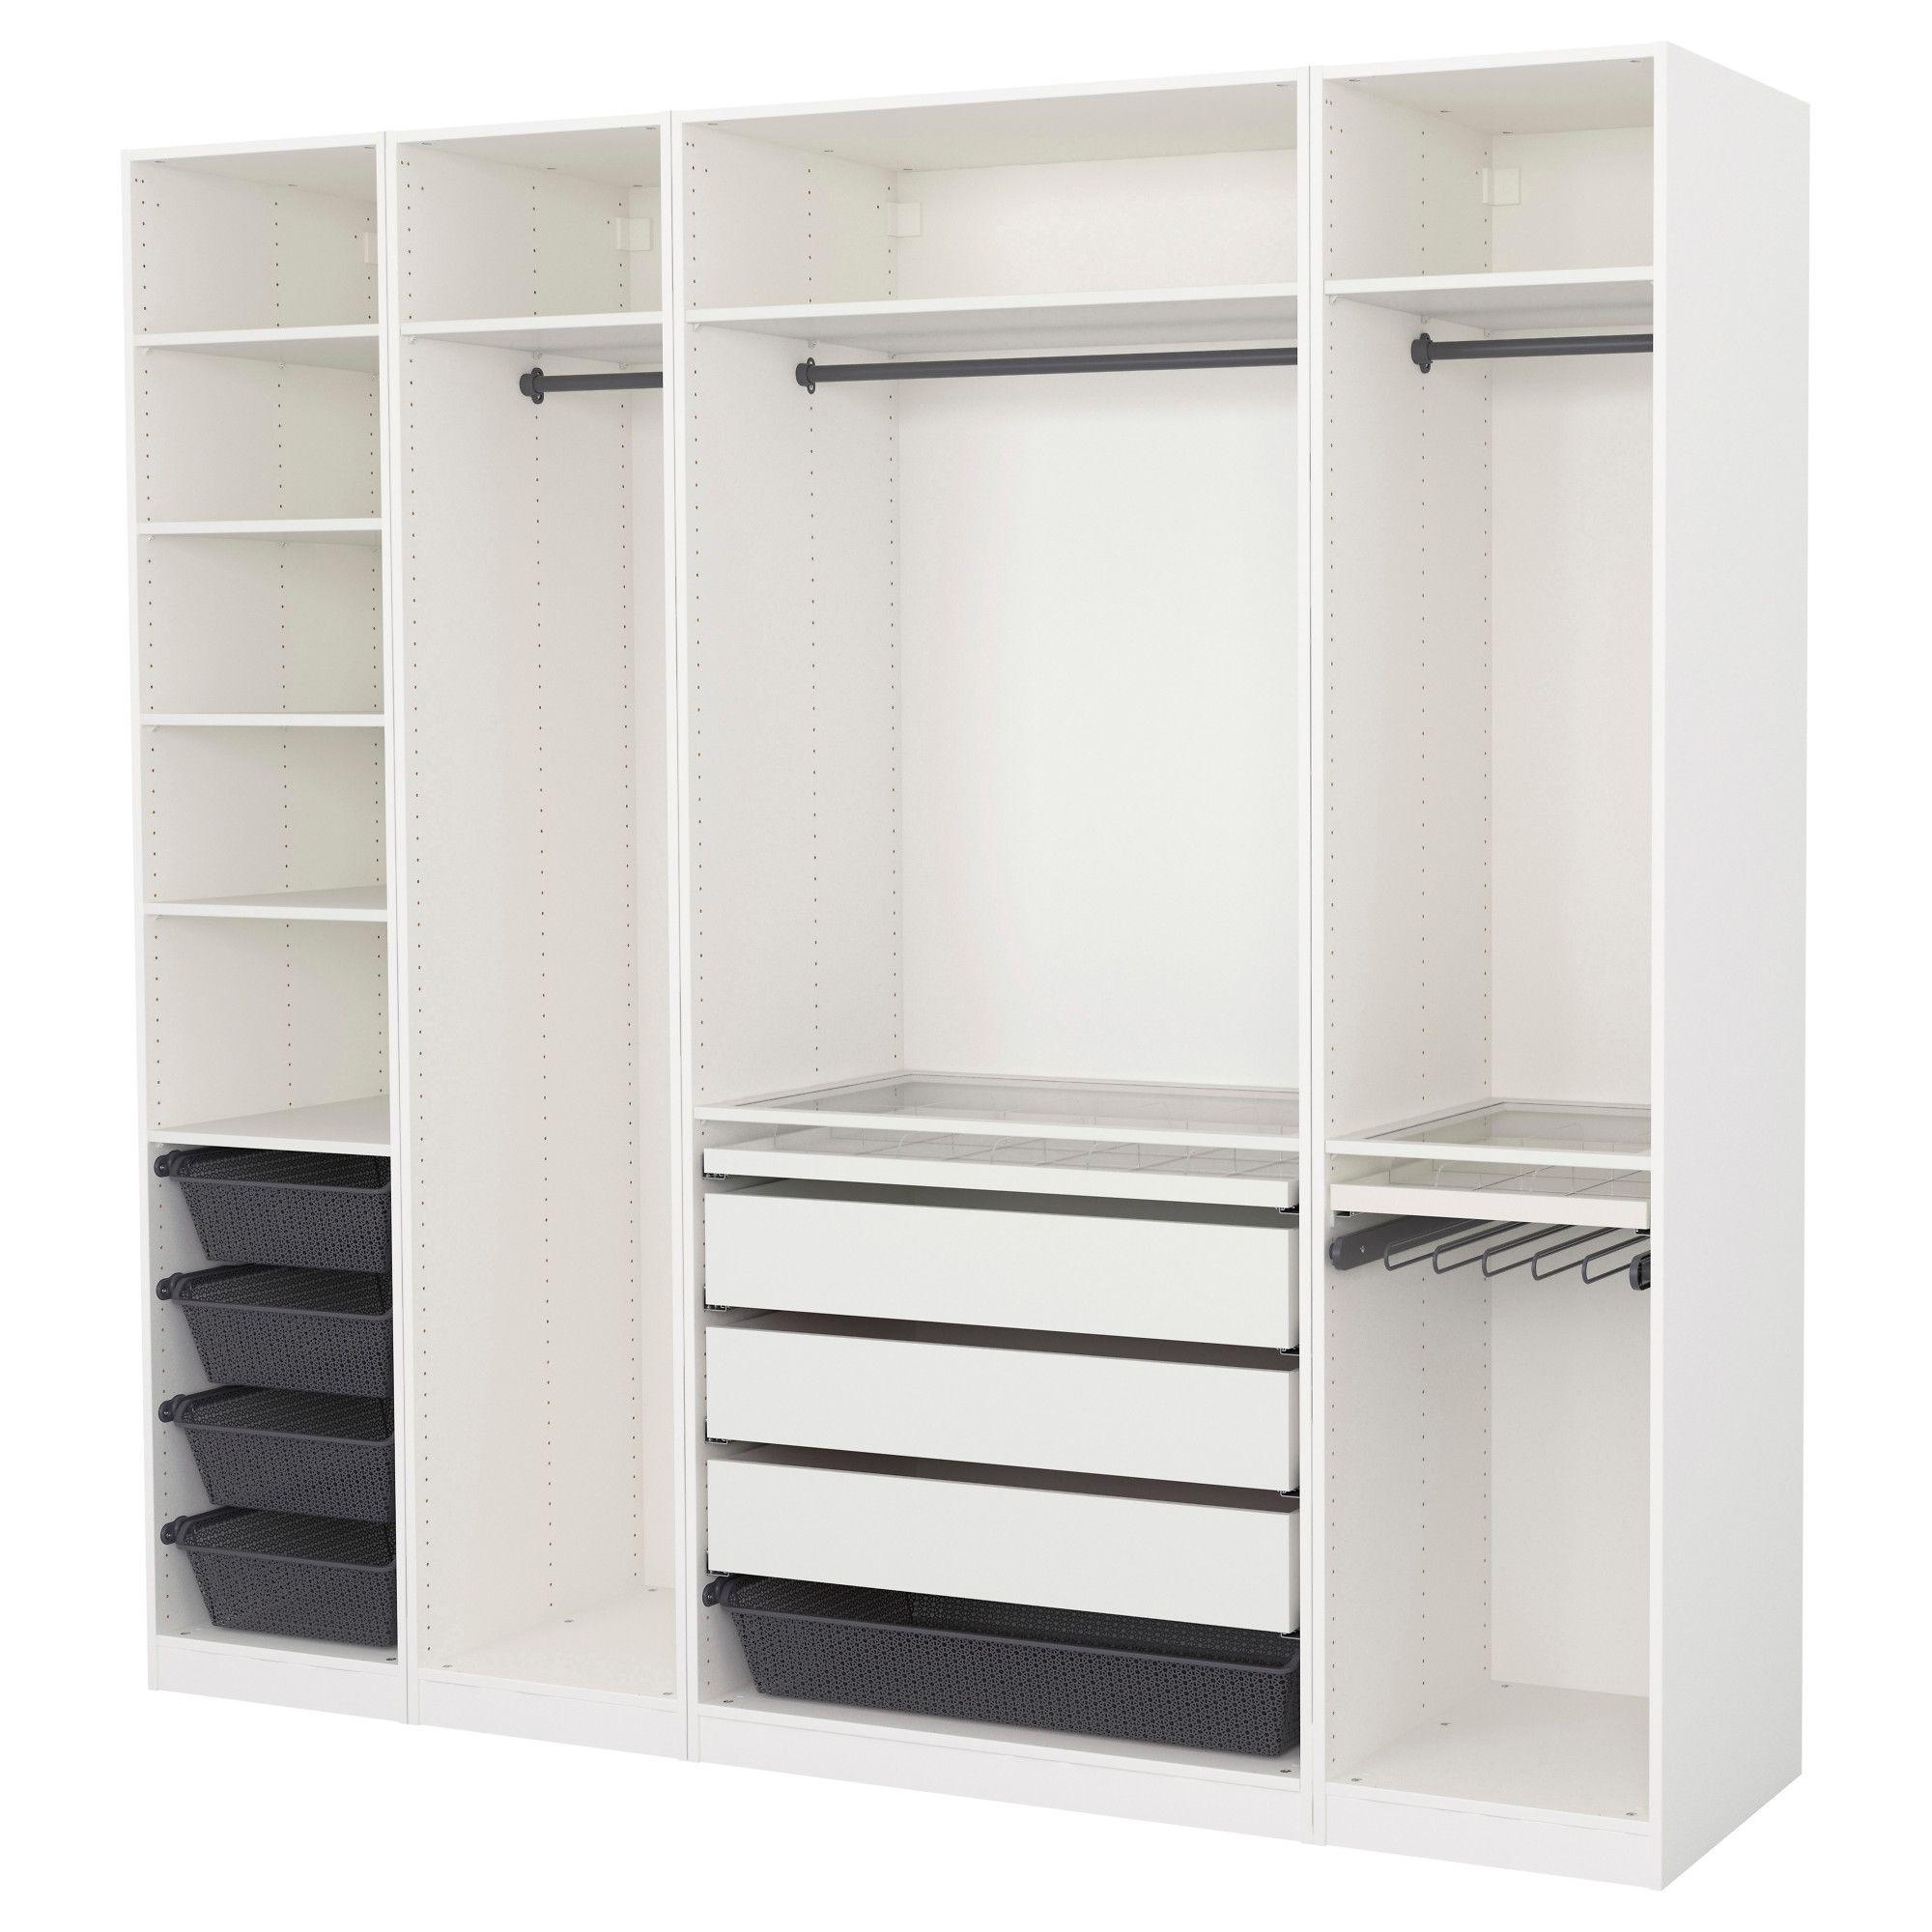 PAX Kledingkast wit 250x58x201 cm Inloopkast ikea